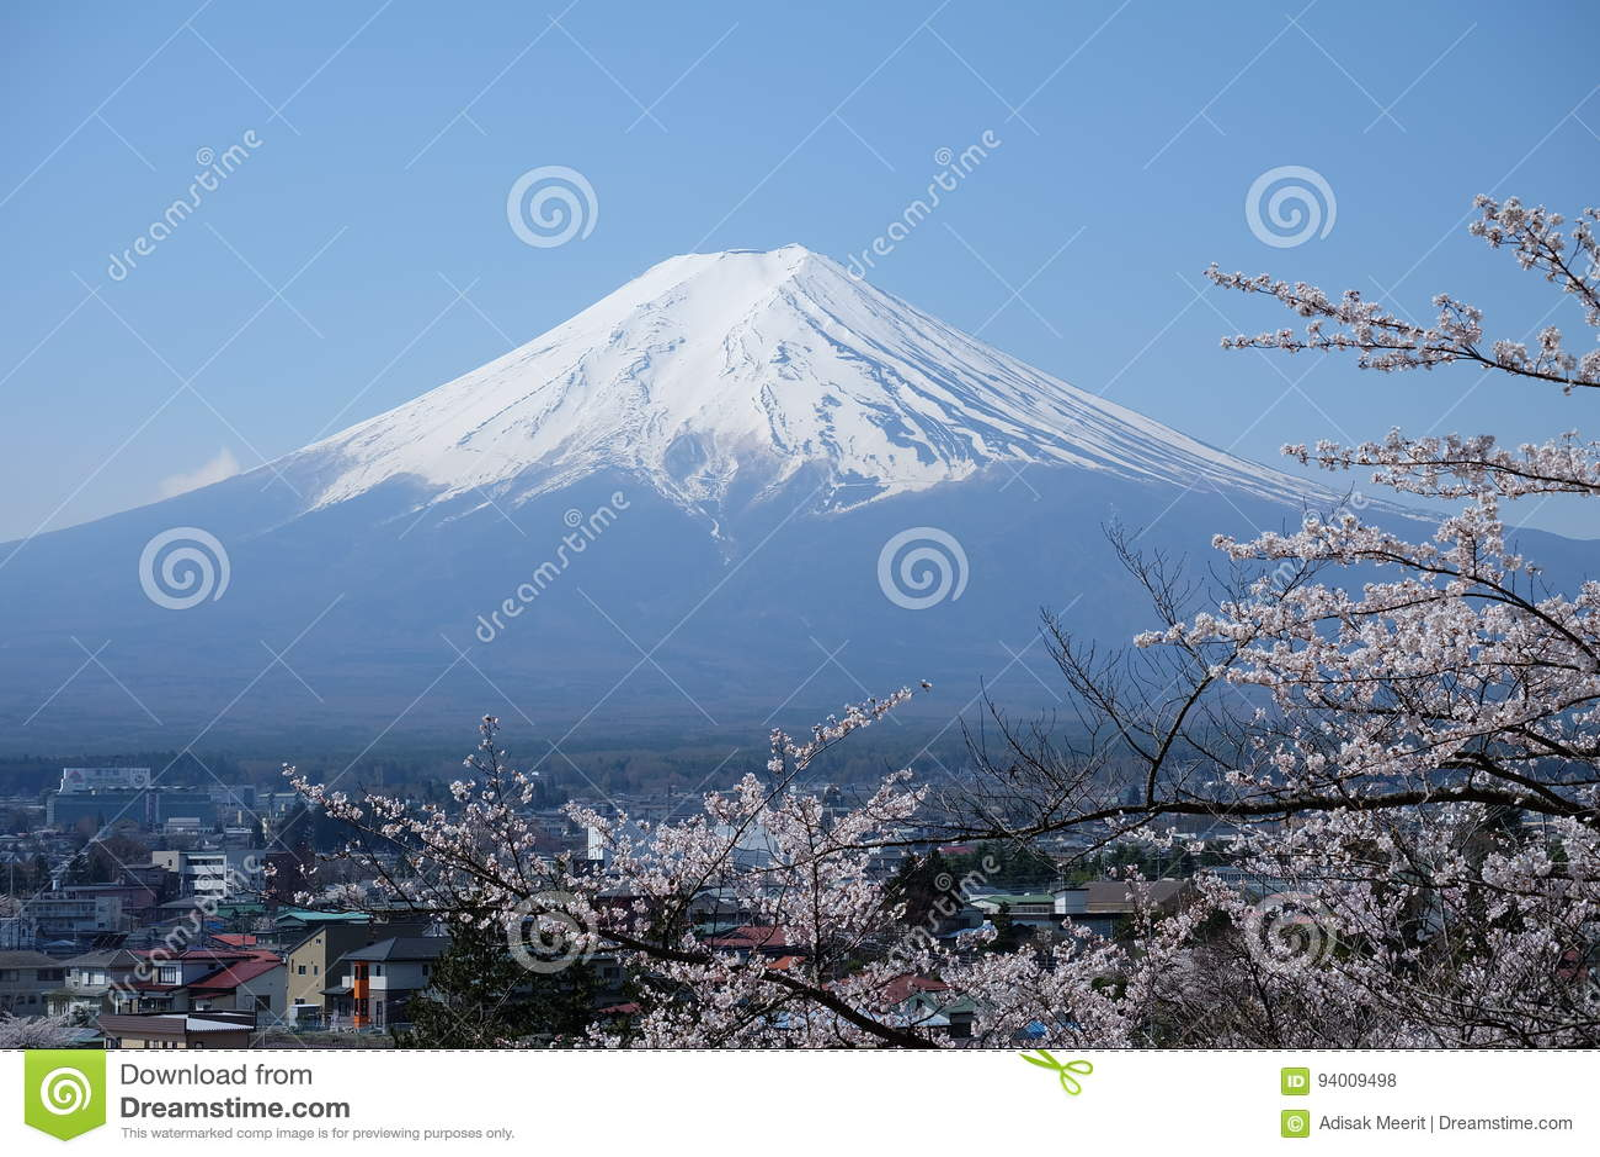 Support Fuji, Fuji San